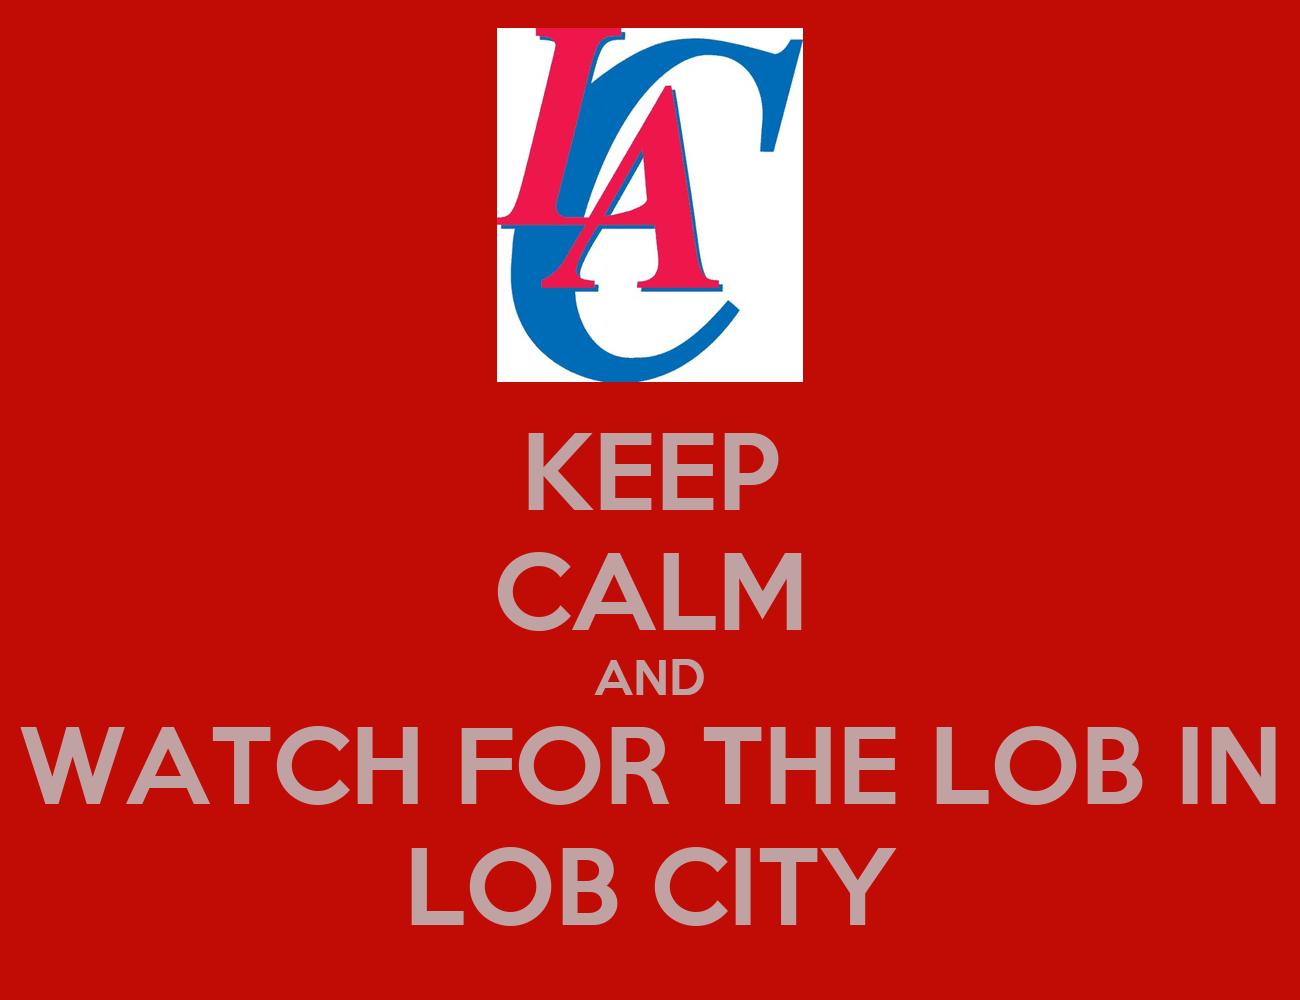 lob city wallpaper - photo #14